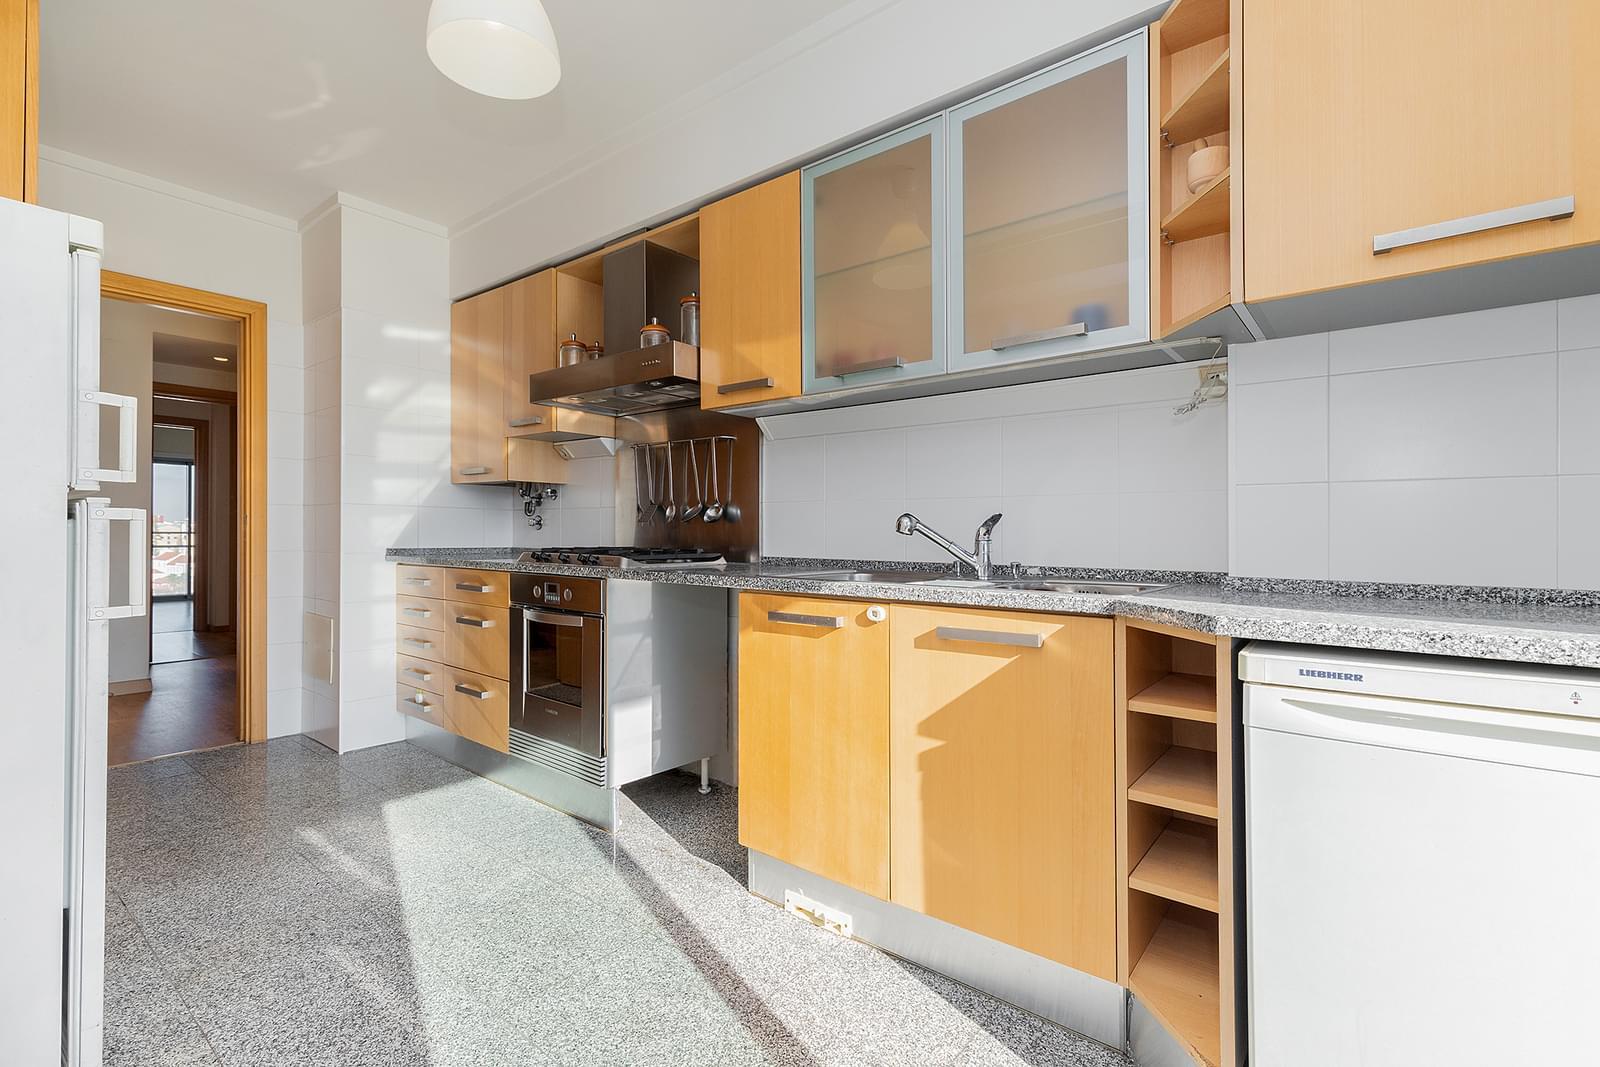 pf18953-apartamento-t3-lisboa-46da78d8-d8b9-4c85-a6af-59cfea88233f